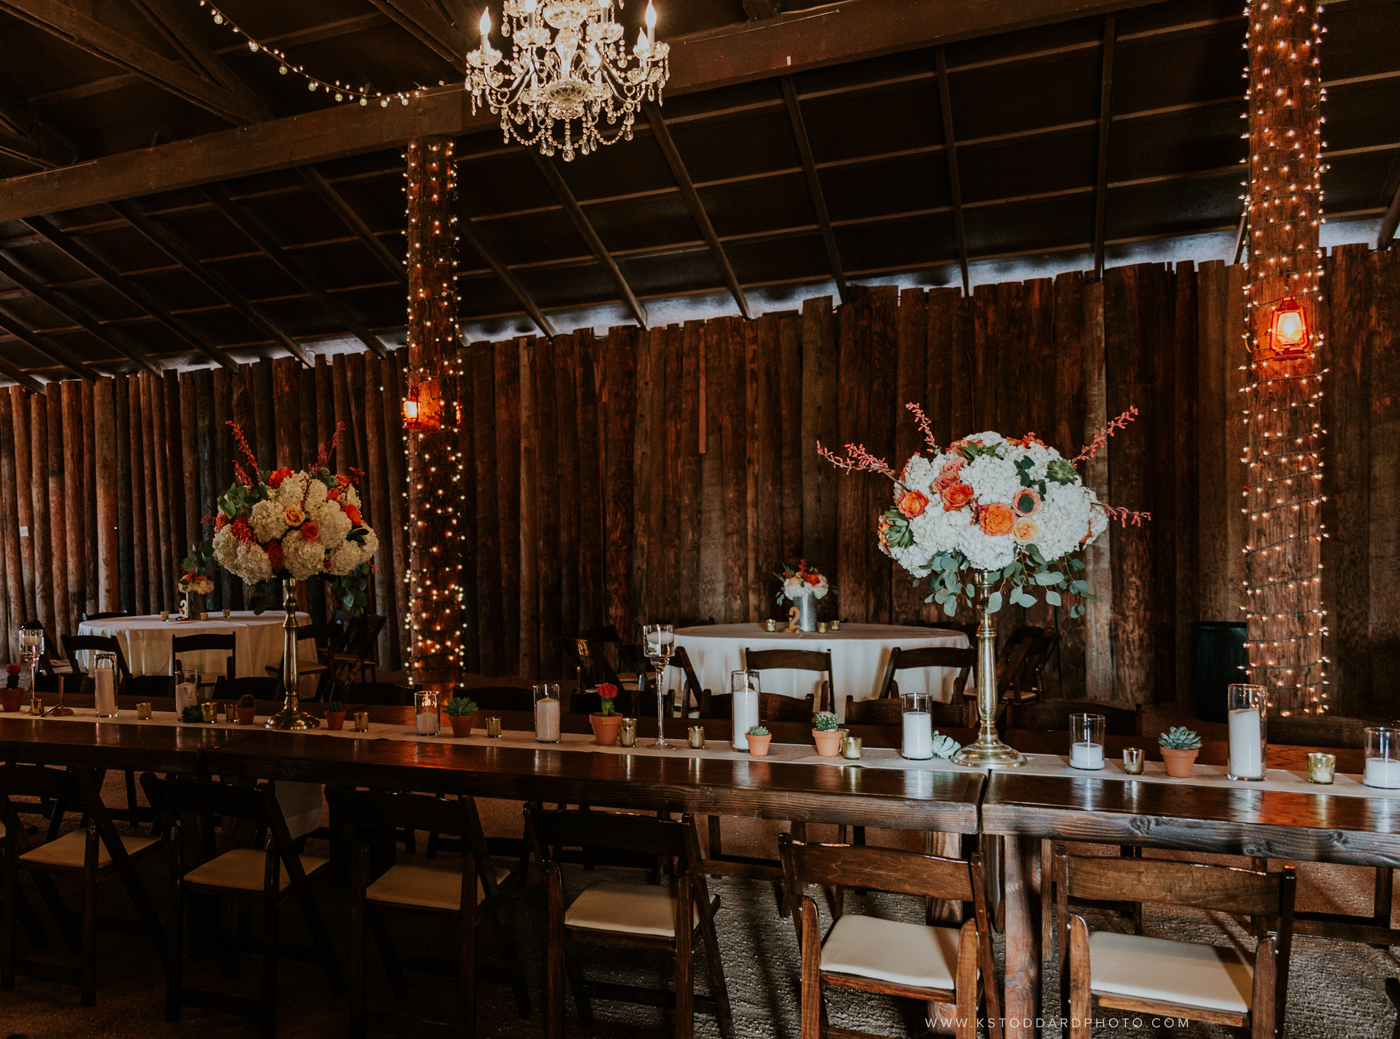 Kiva and Grant -Desert Foothills Wedding -Scottsdale, Arizona107-3_1.jpg